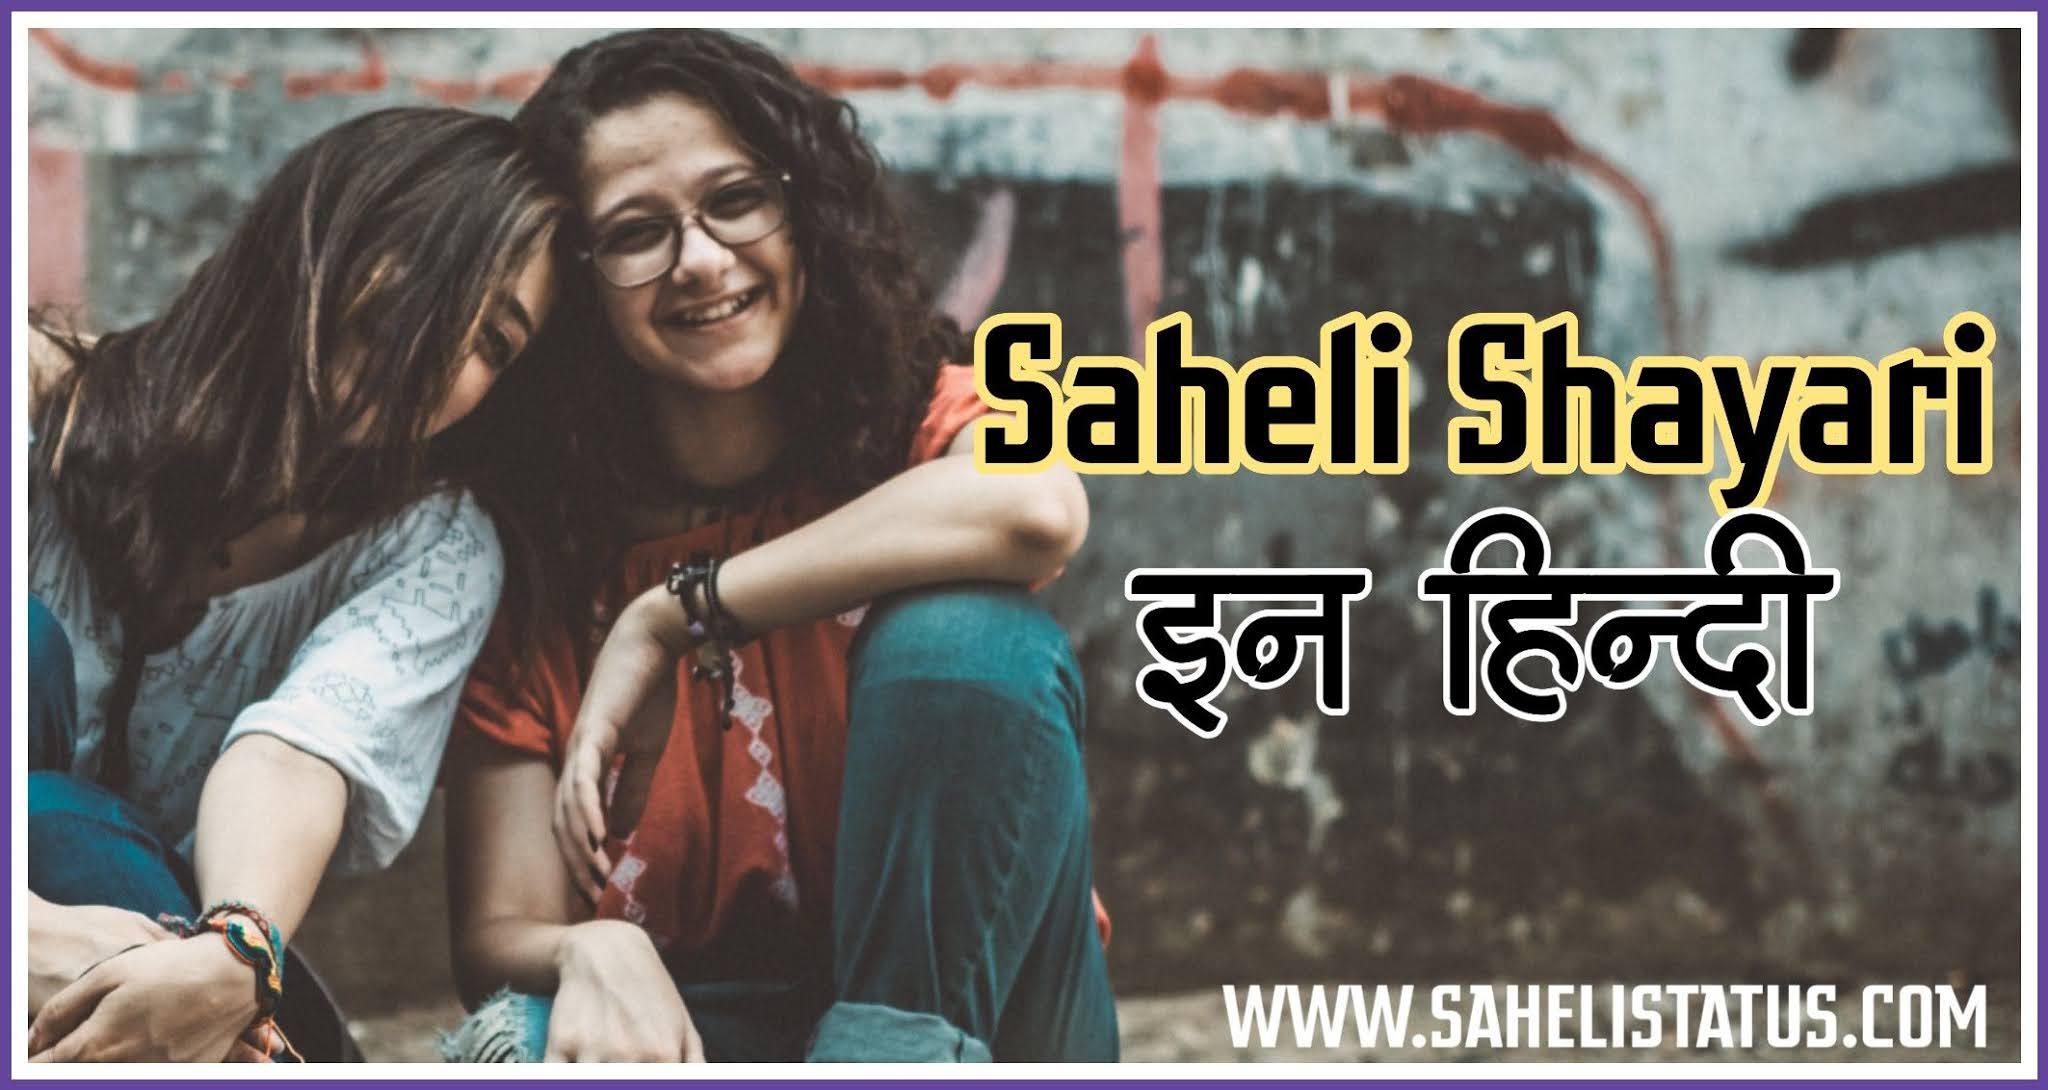 Saheli Shayari - Shayari on Saheli